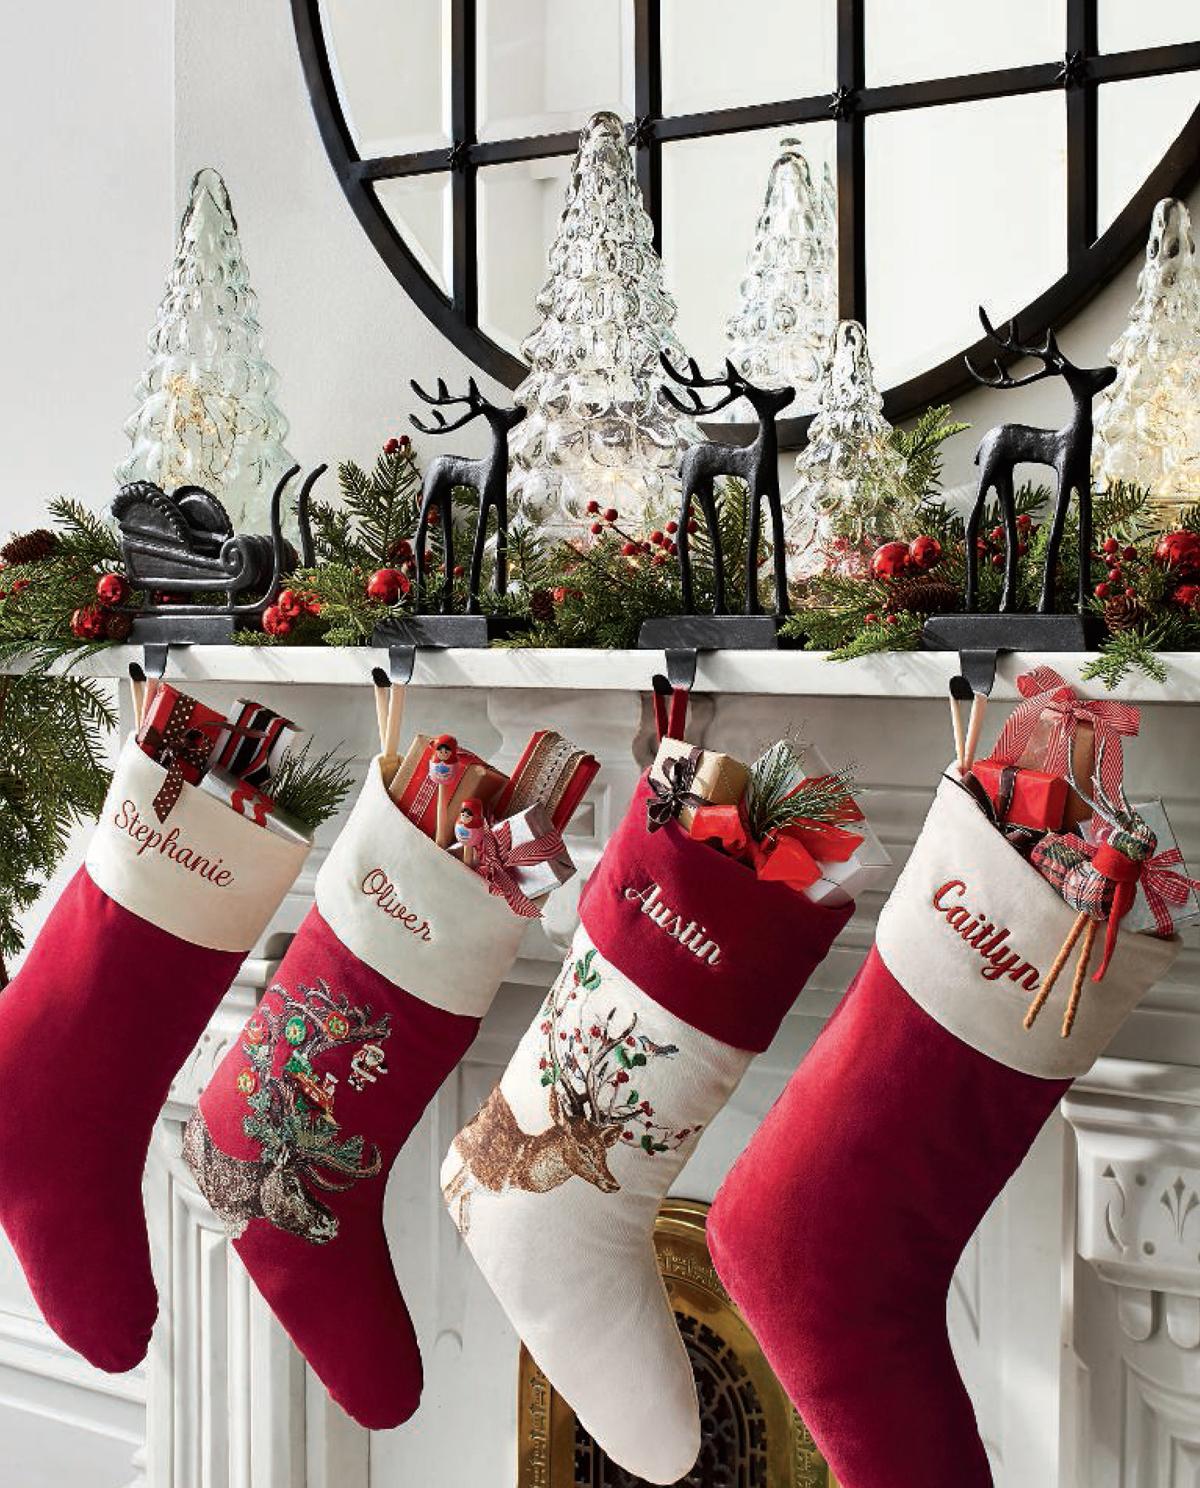 Nostalgic Christmas Decorations: Rustic Christmas Decorating Ideas